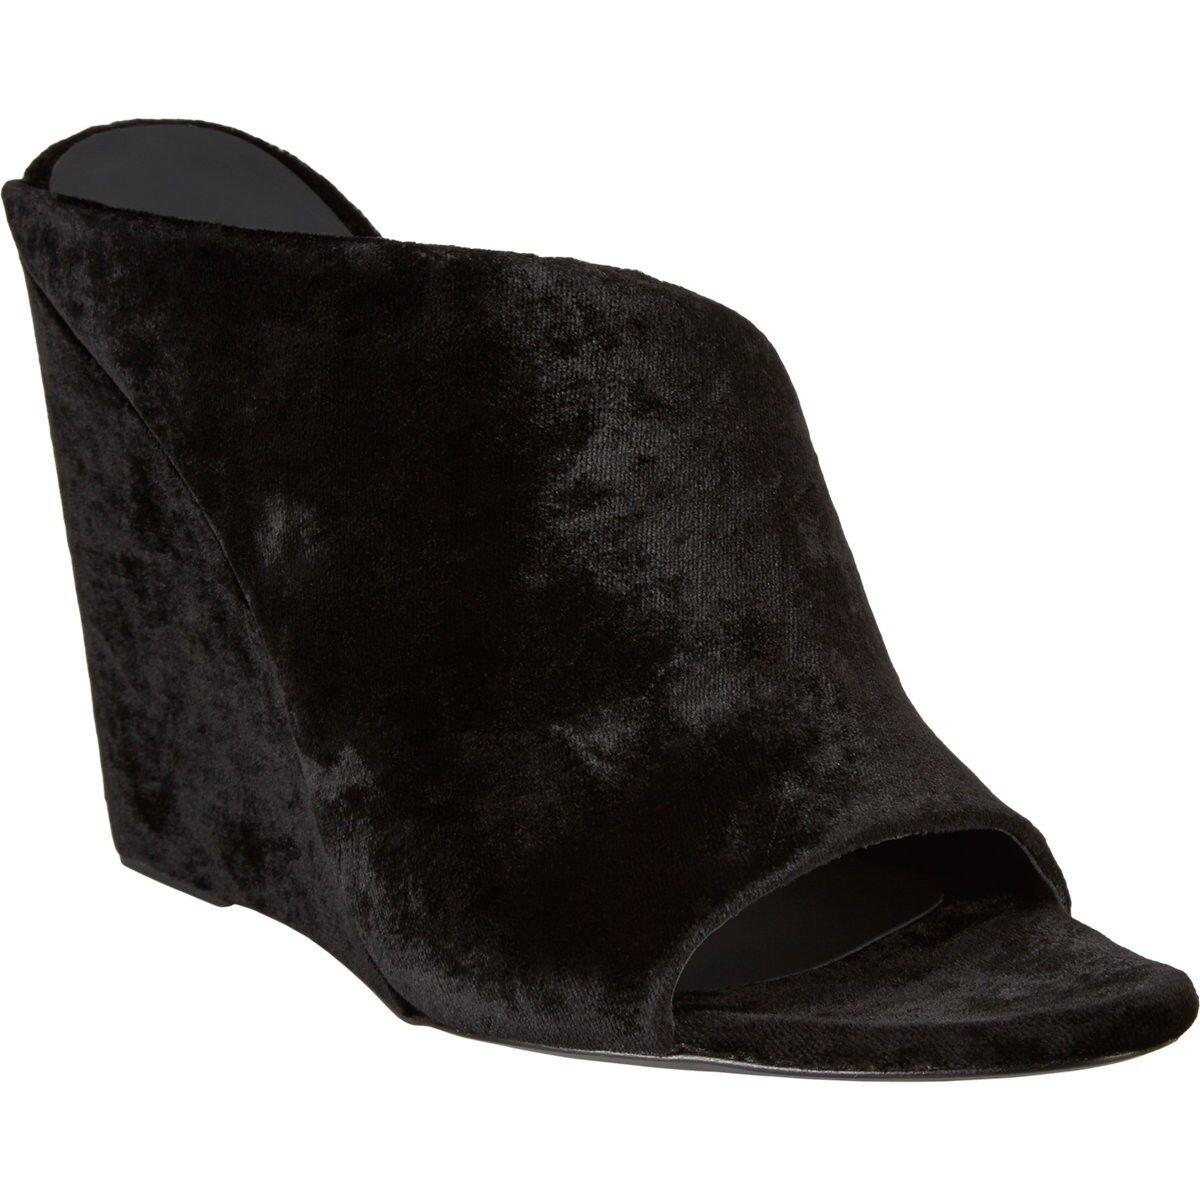 625 AUTH NIB ALEXANDER WANG Eniko Wedge Sz Slide Sandals Sz Wedge 37 9643d8